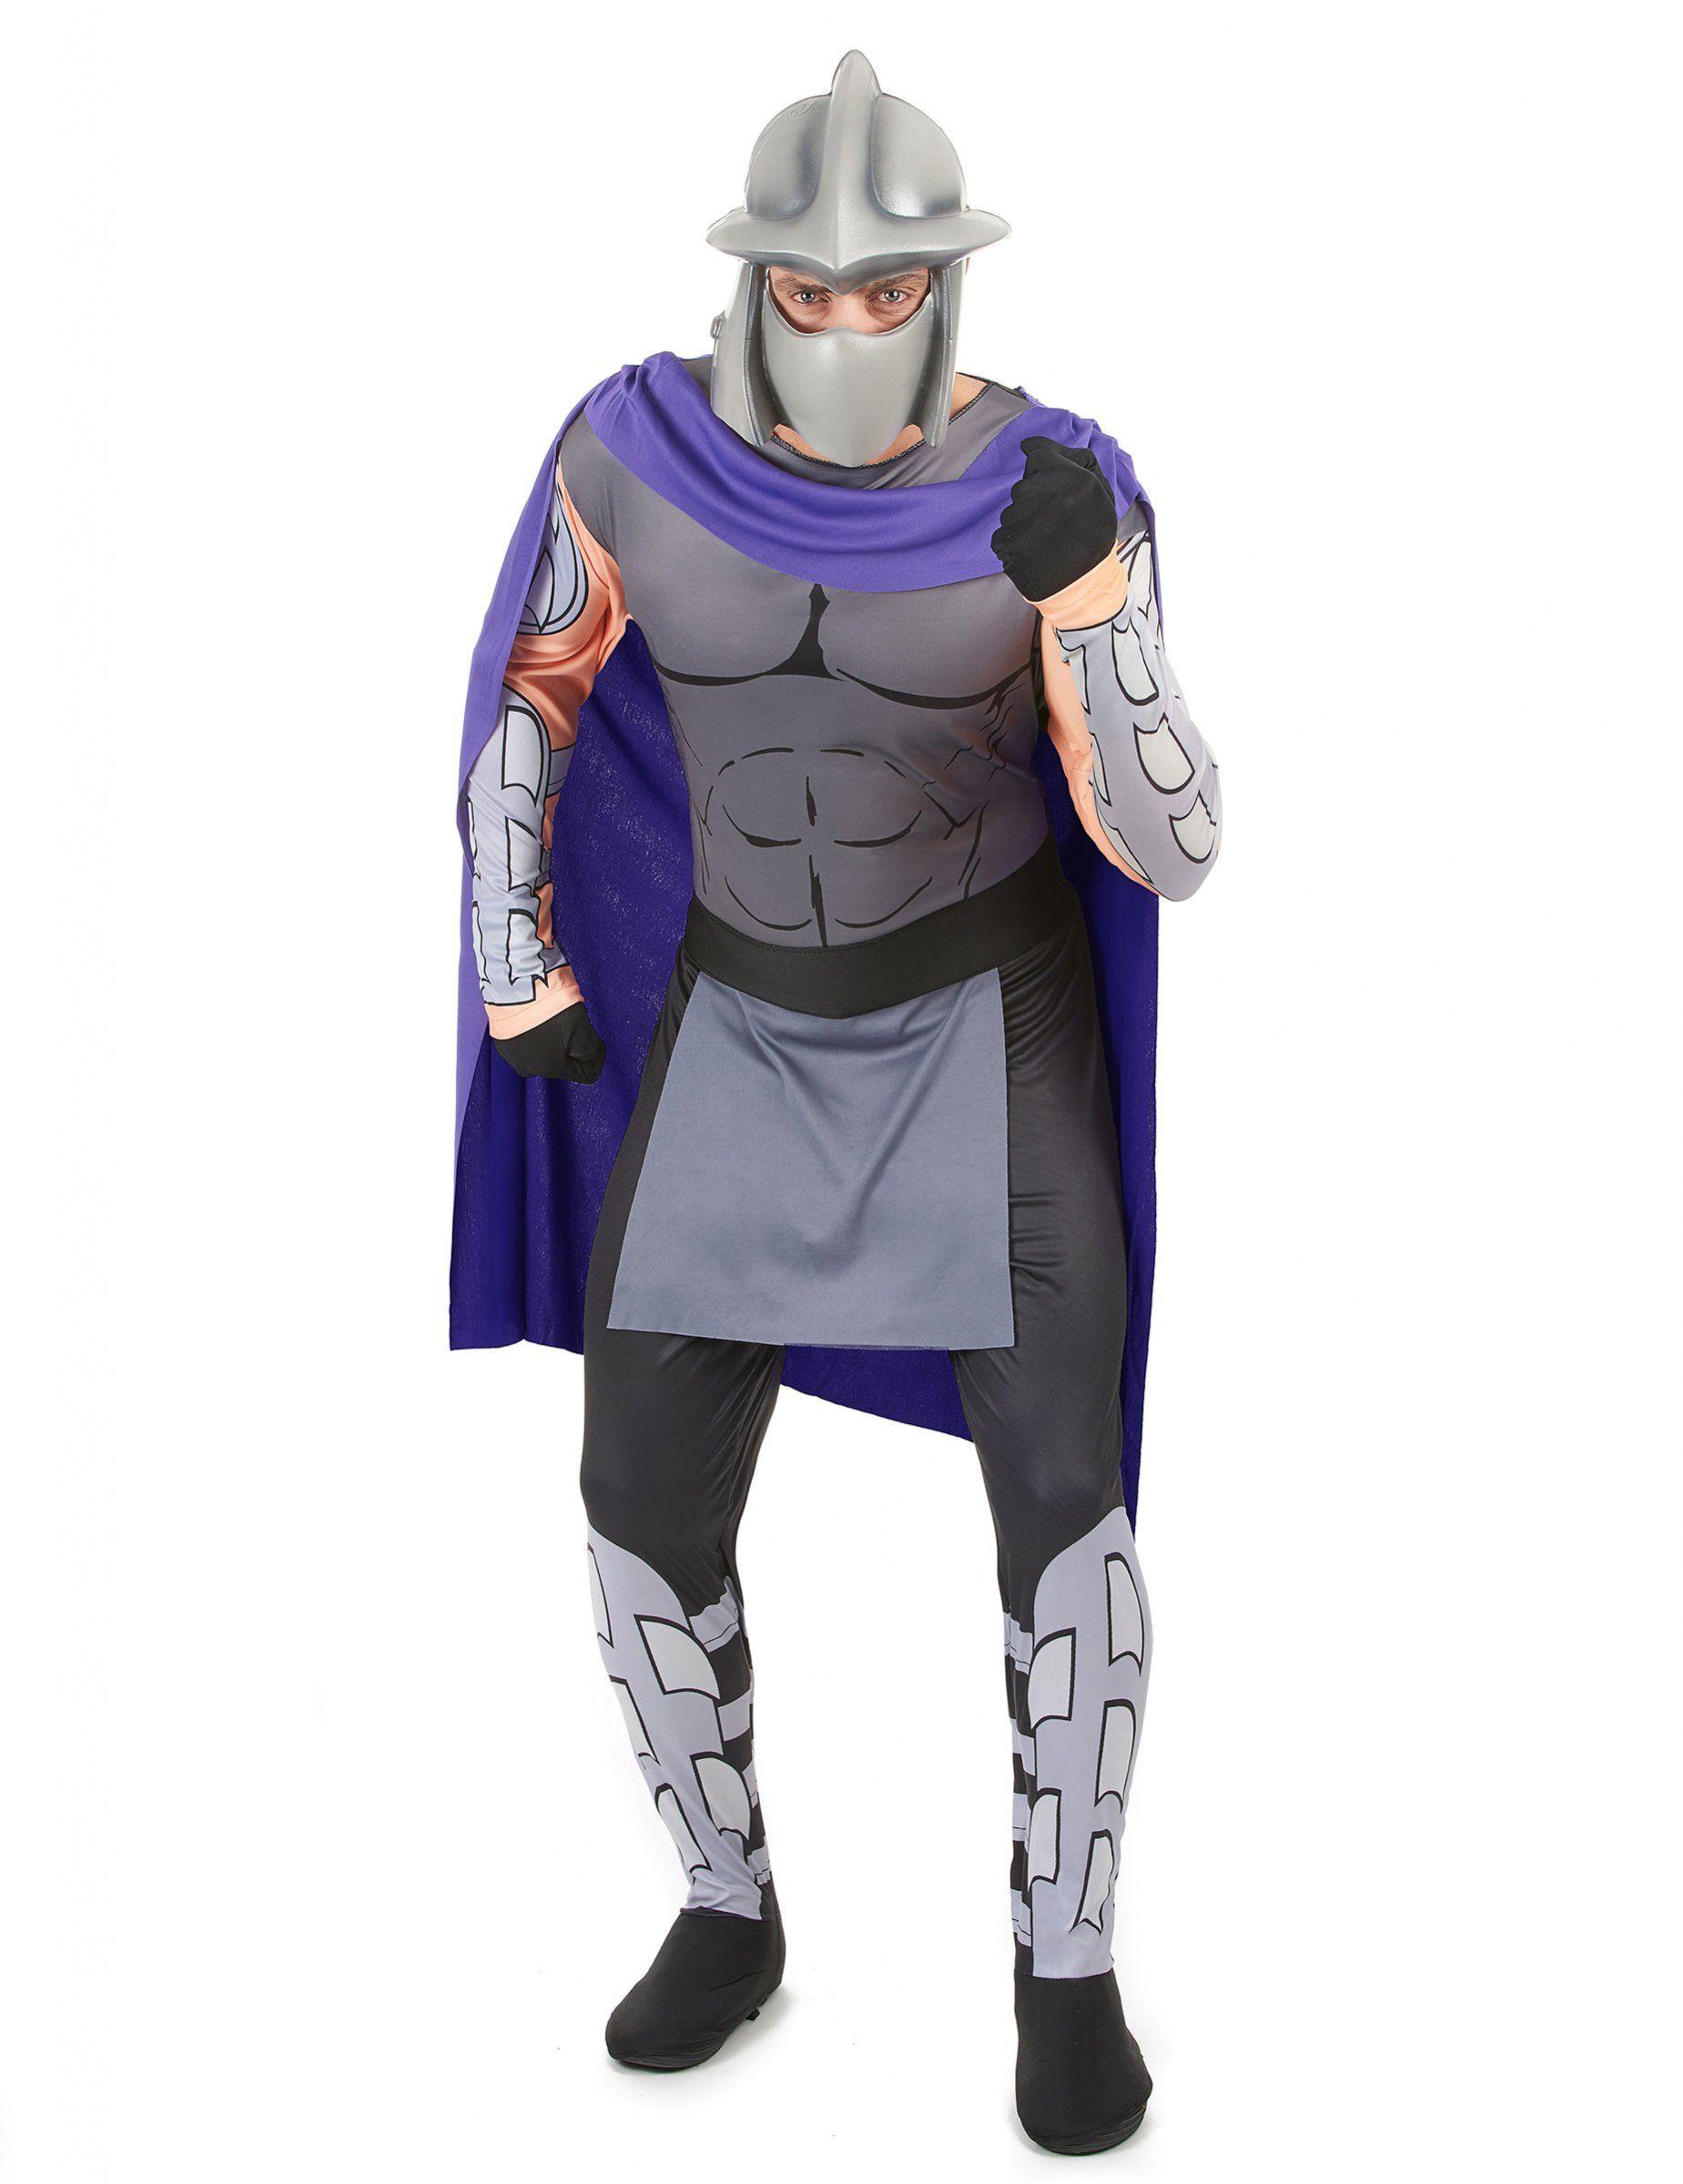 Ninja-turtles-kostüm shredder schwarz-lila | Ninja-Turtles-Kostüme ...